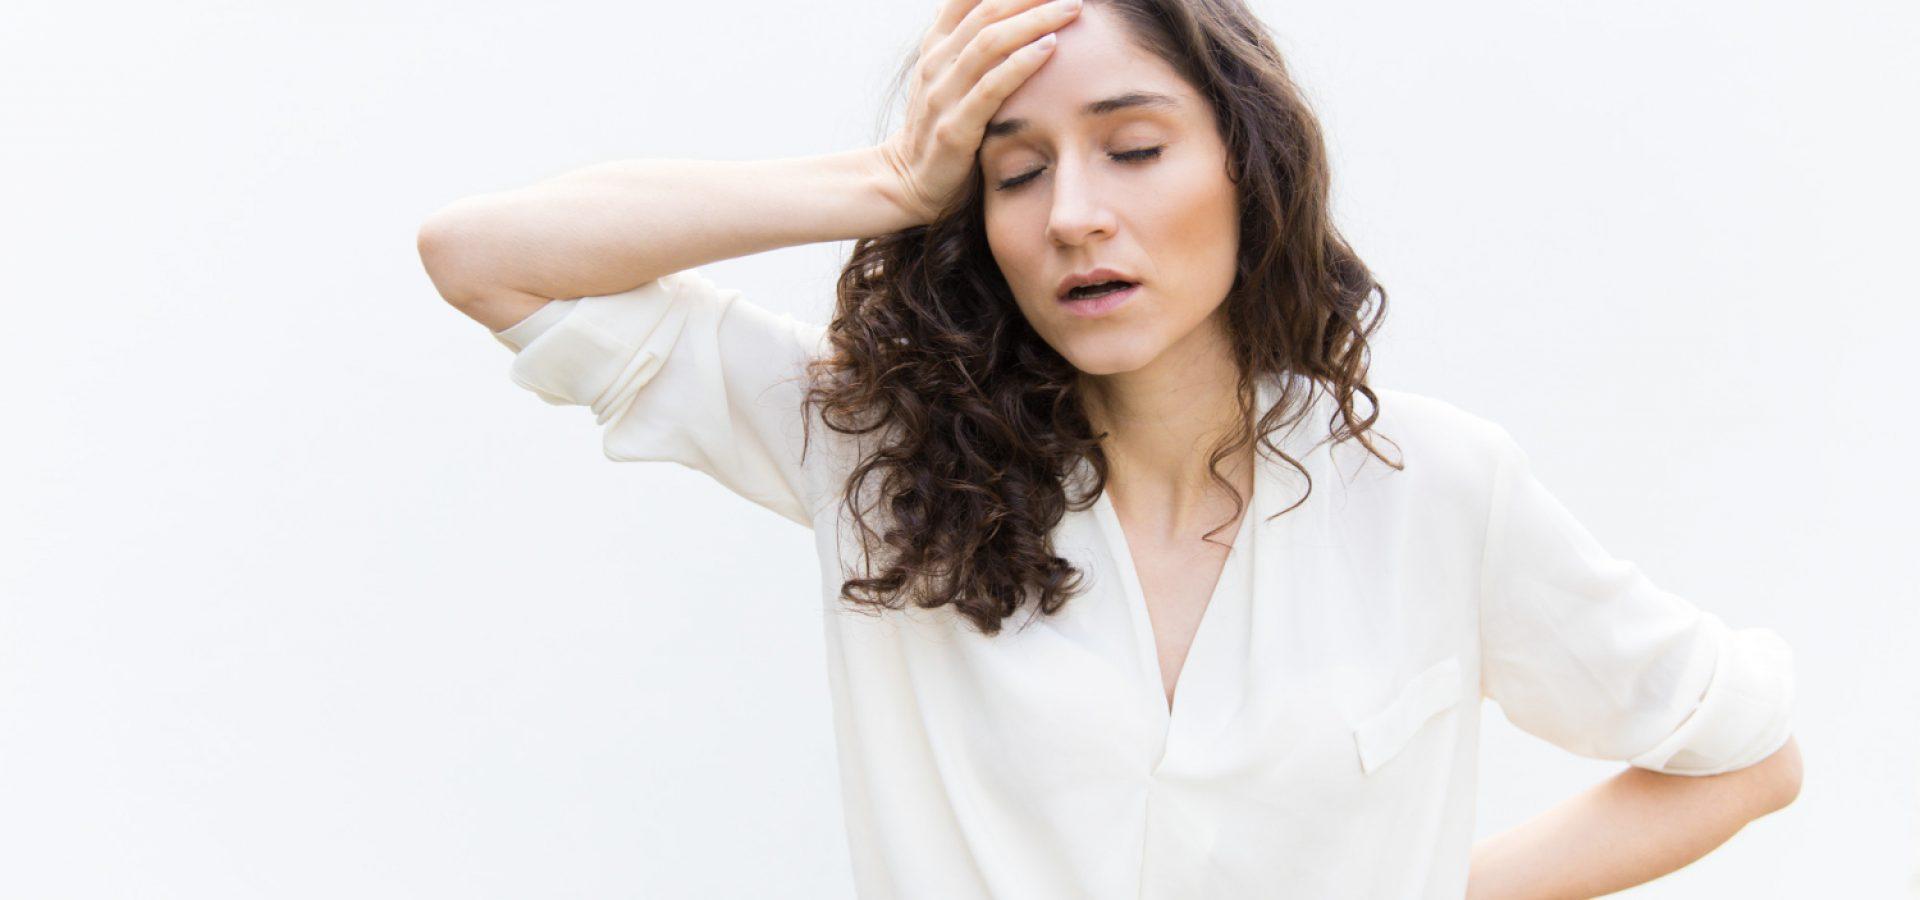 Woman with hearing loss also suffering from vertigo